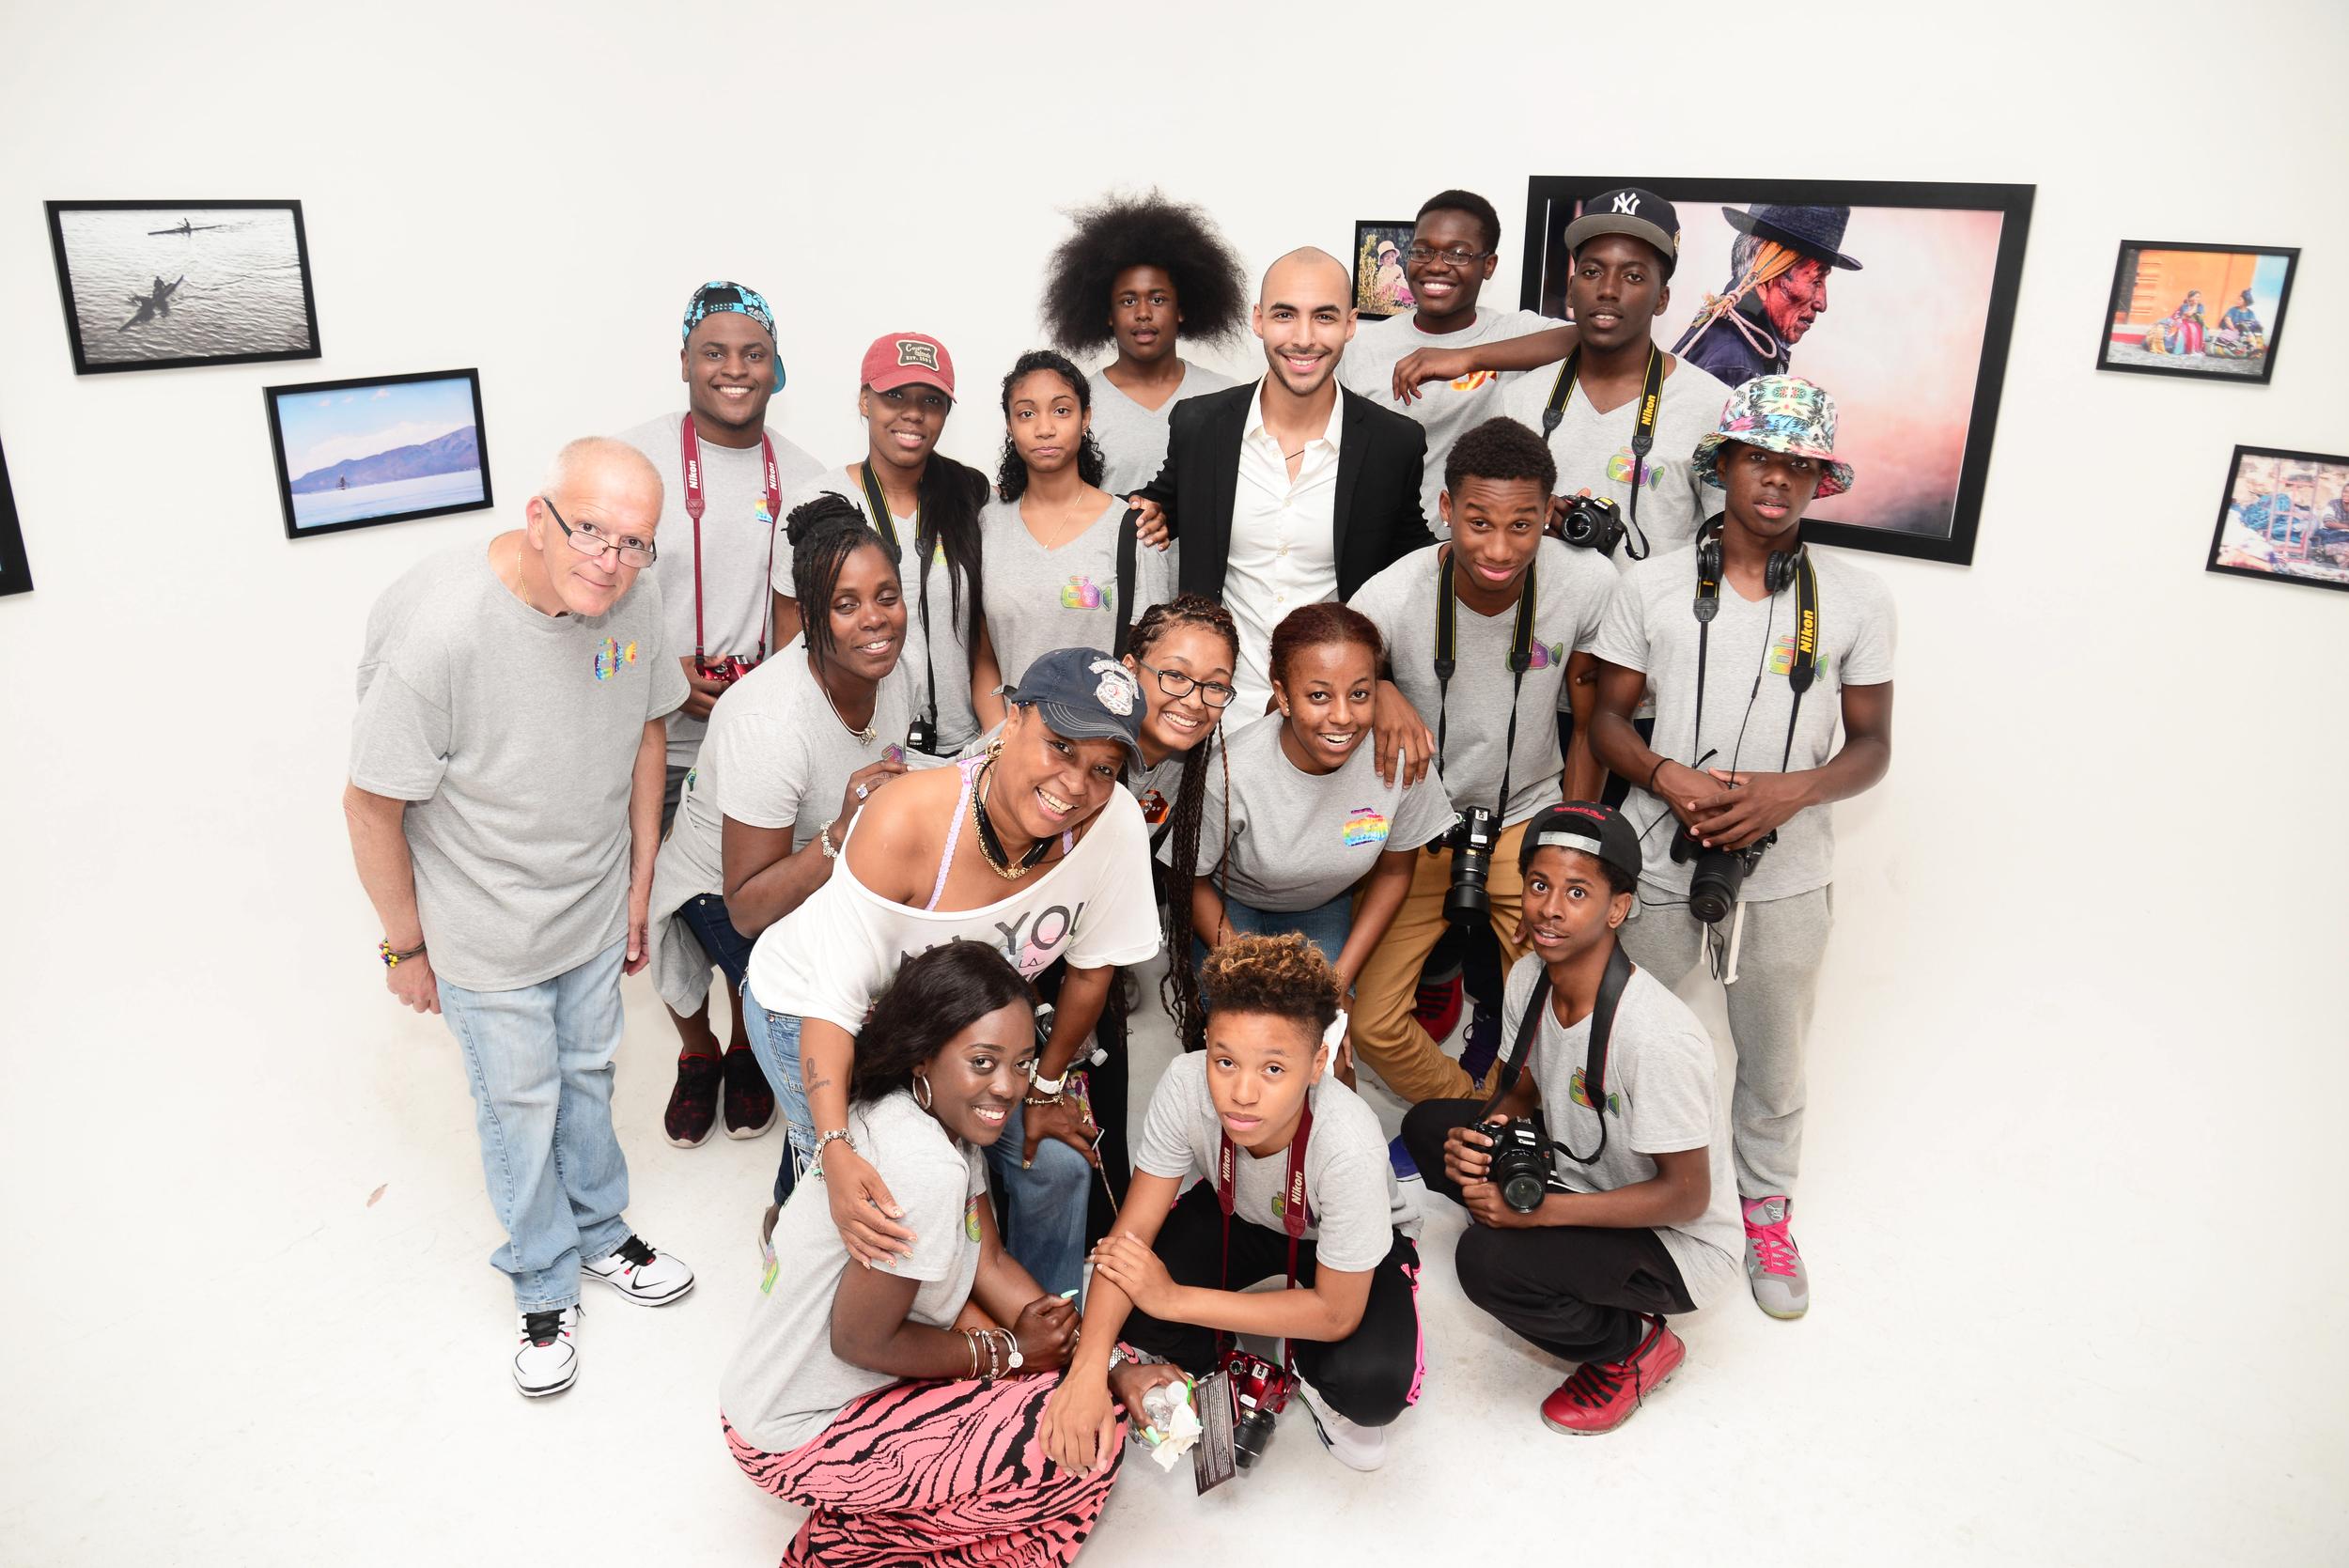 Coney Island Generation Gap (CIGG) with Raul at KAWSAY gallery show